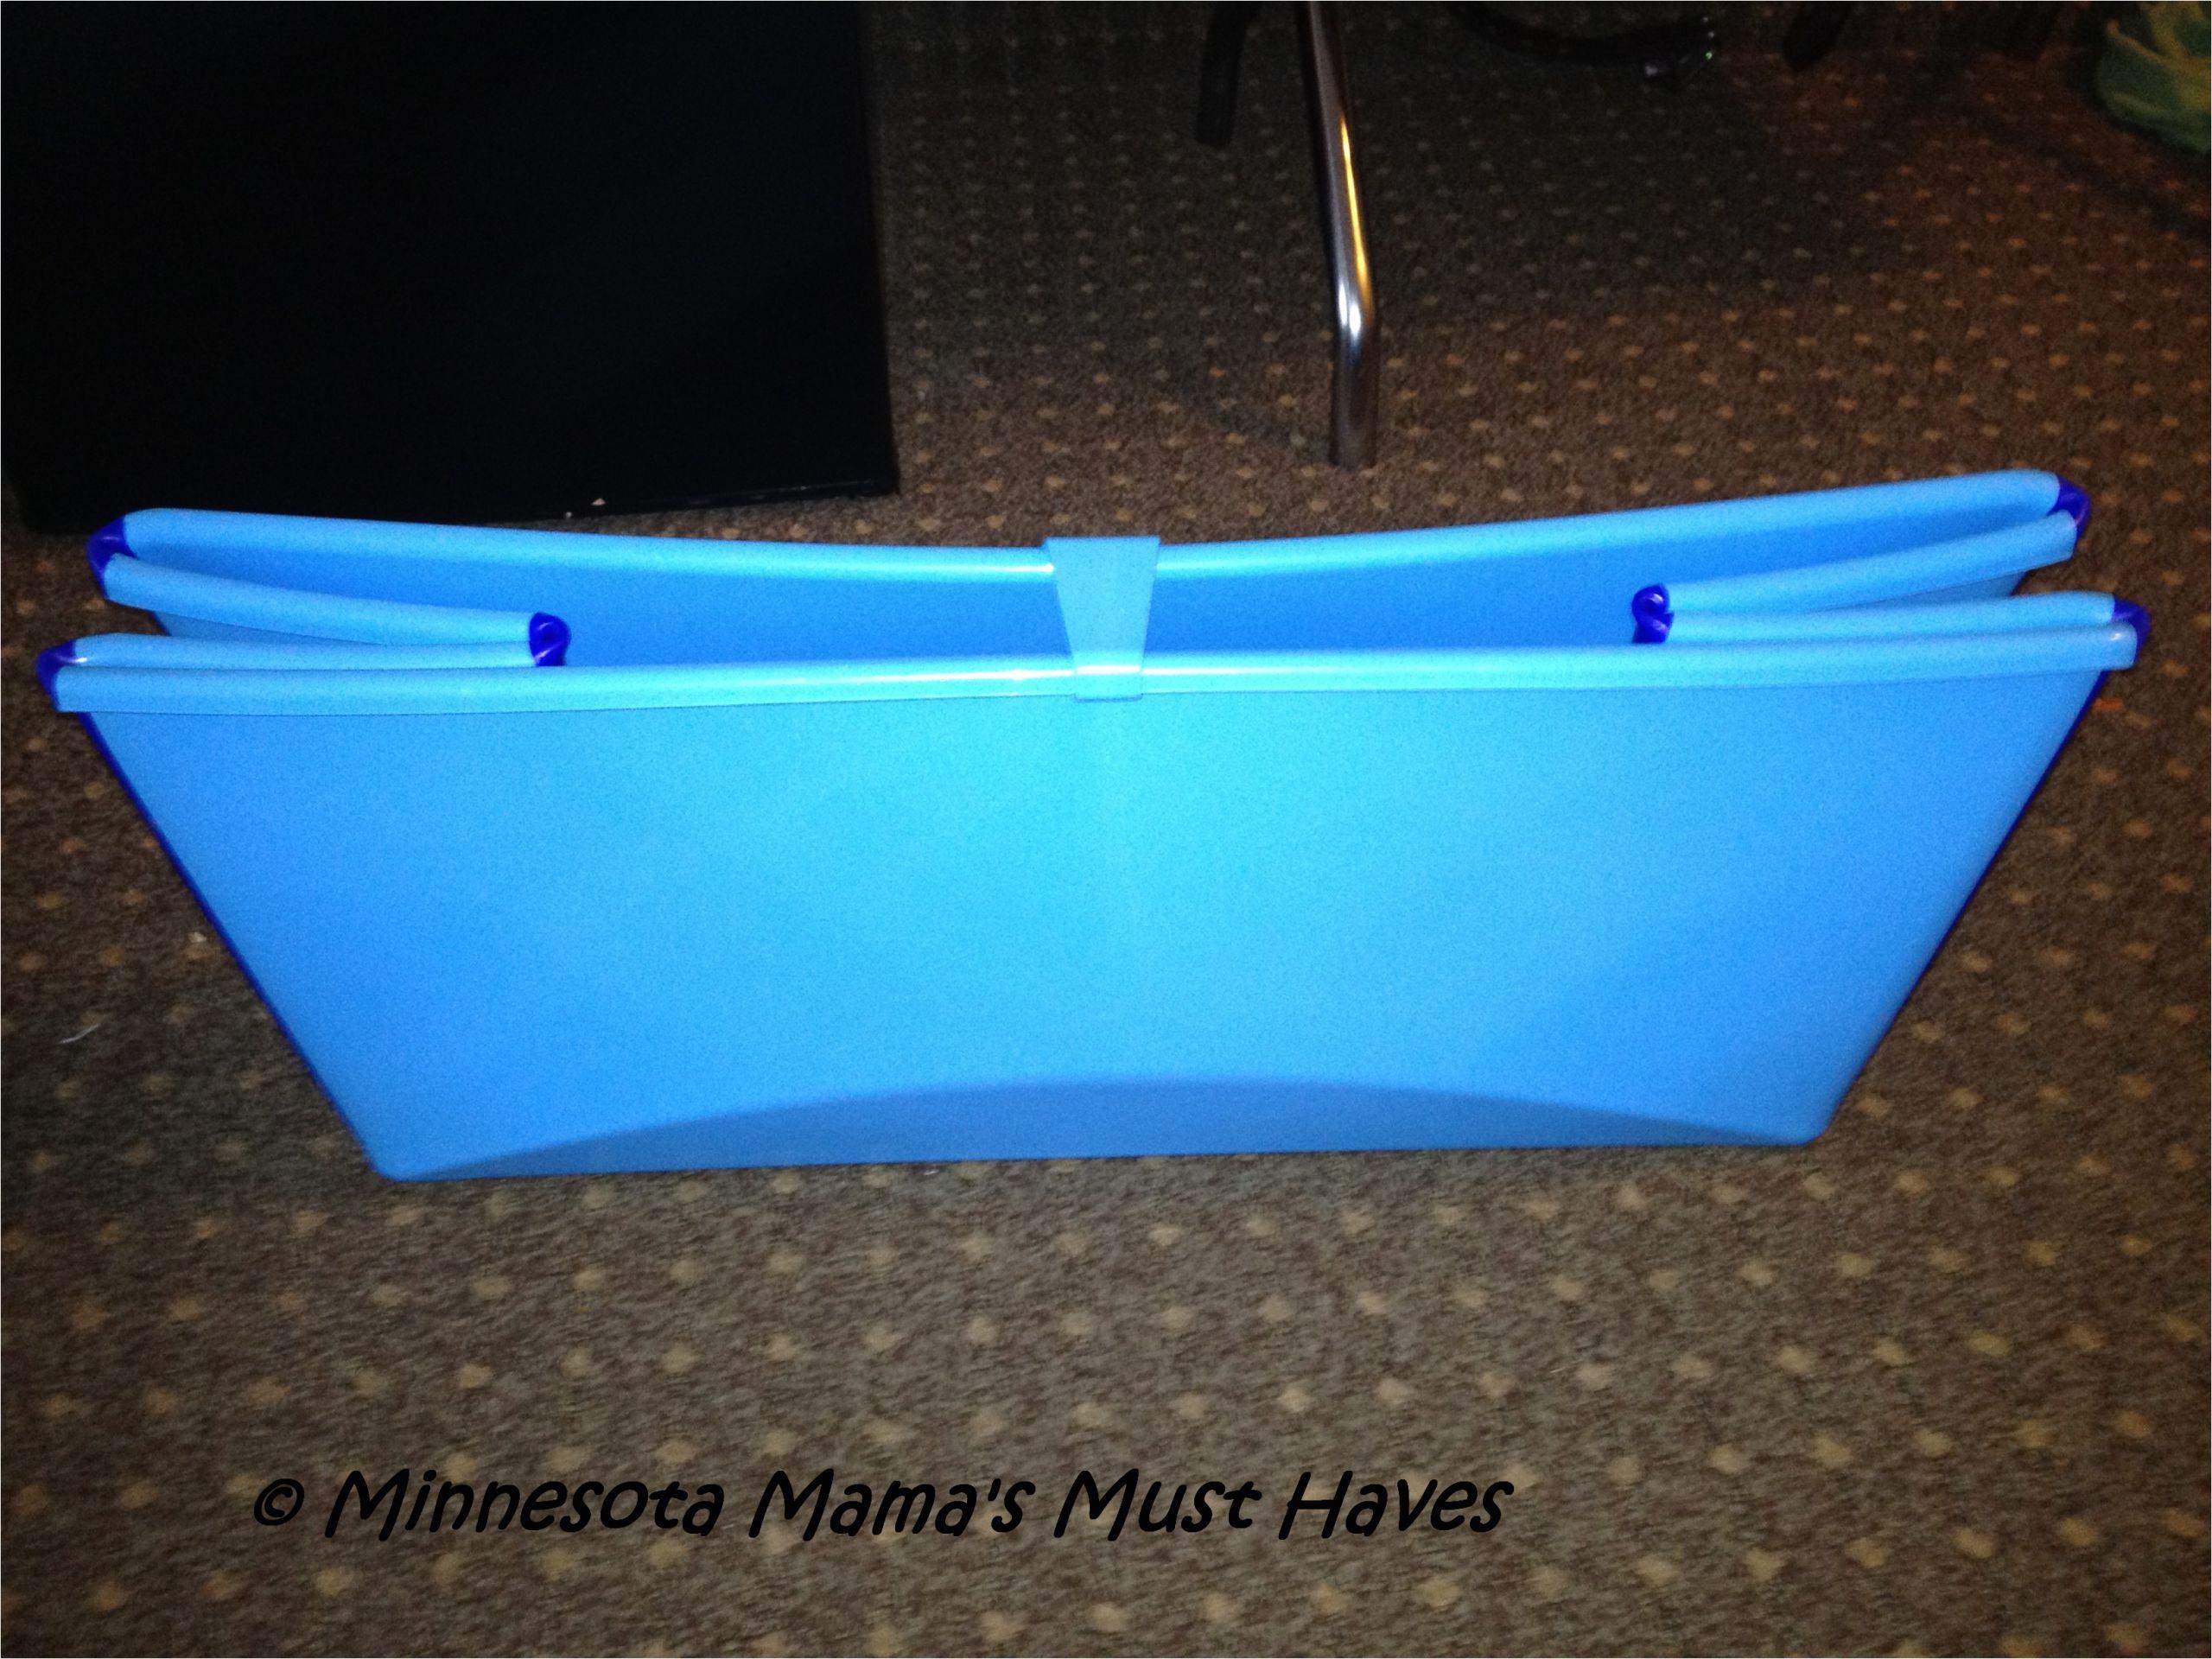 Portable Bathtub for Camping Smallest Folding Most Portable Bath Bath Tub Minnesota